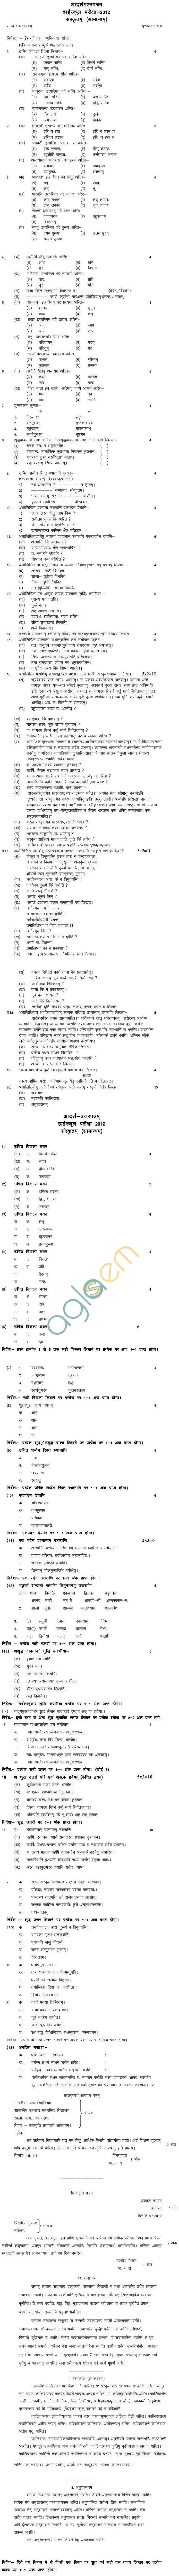 MP BoardClass X Sanskrit GeneralModel Questions & Answers - Set 2